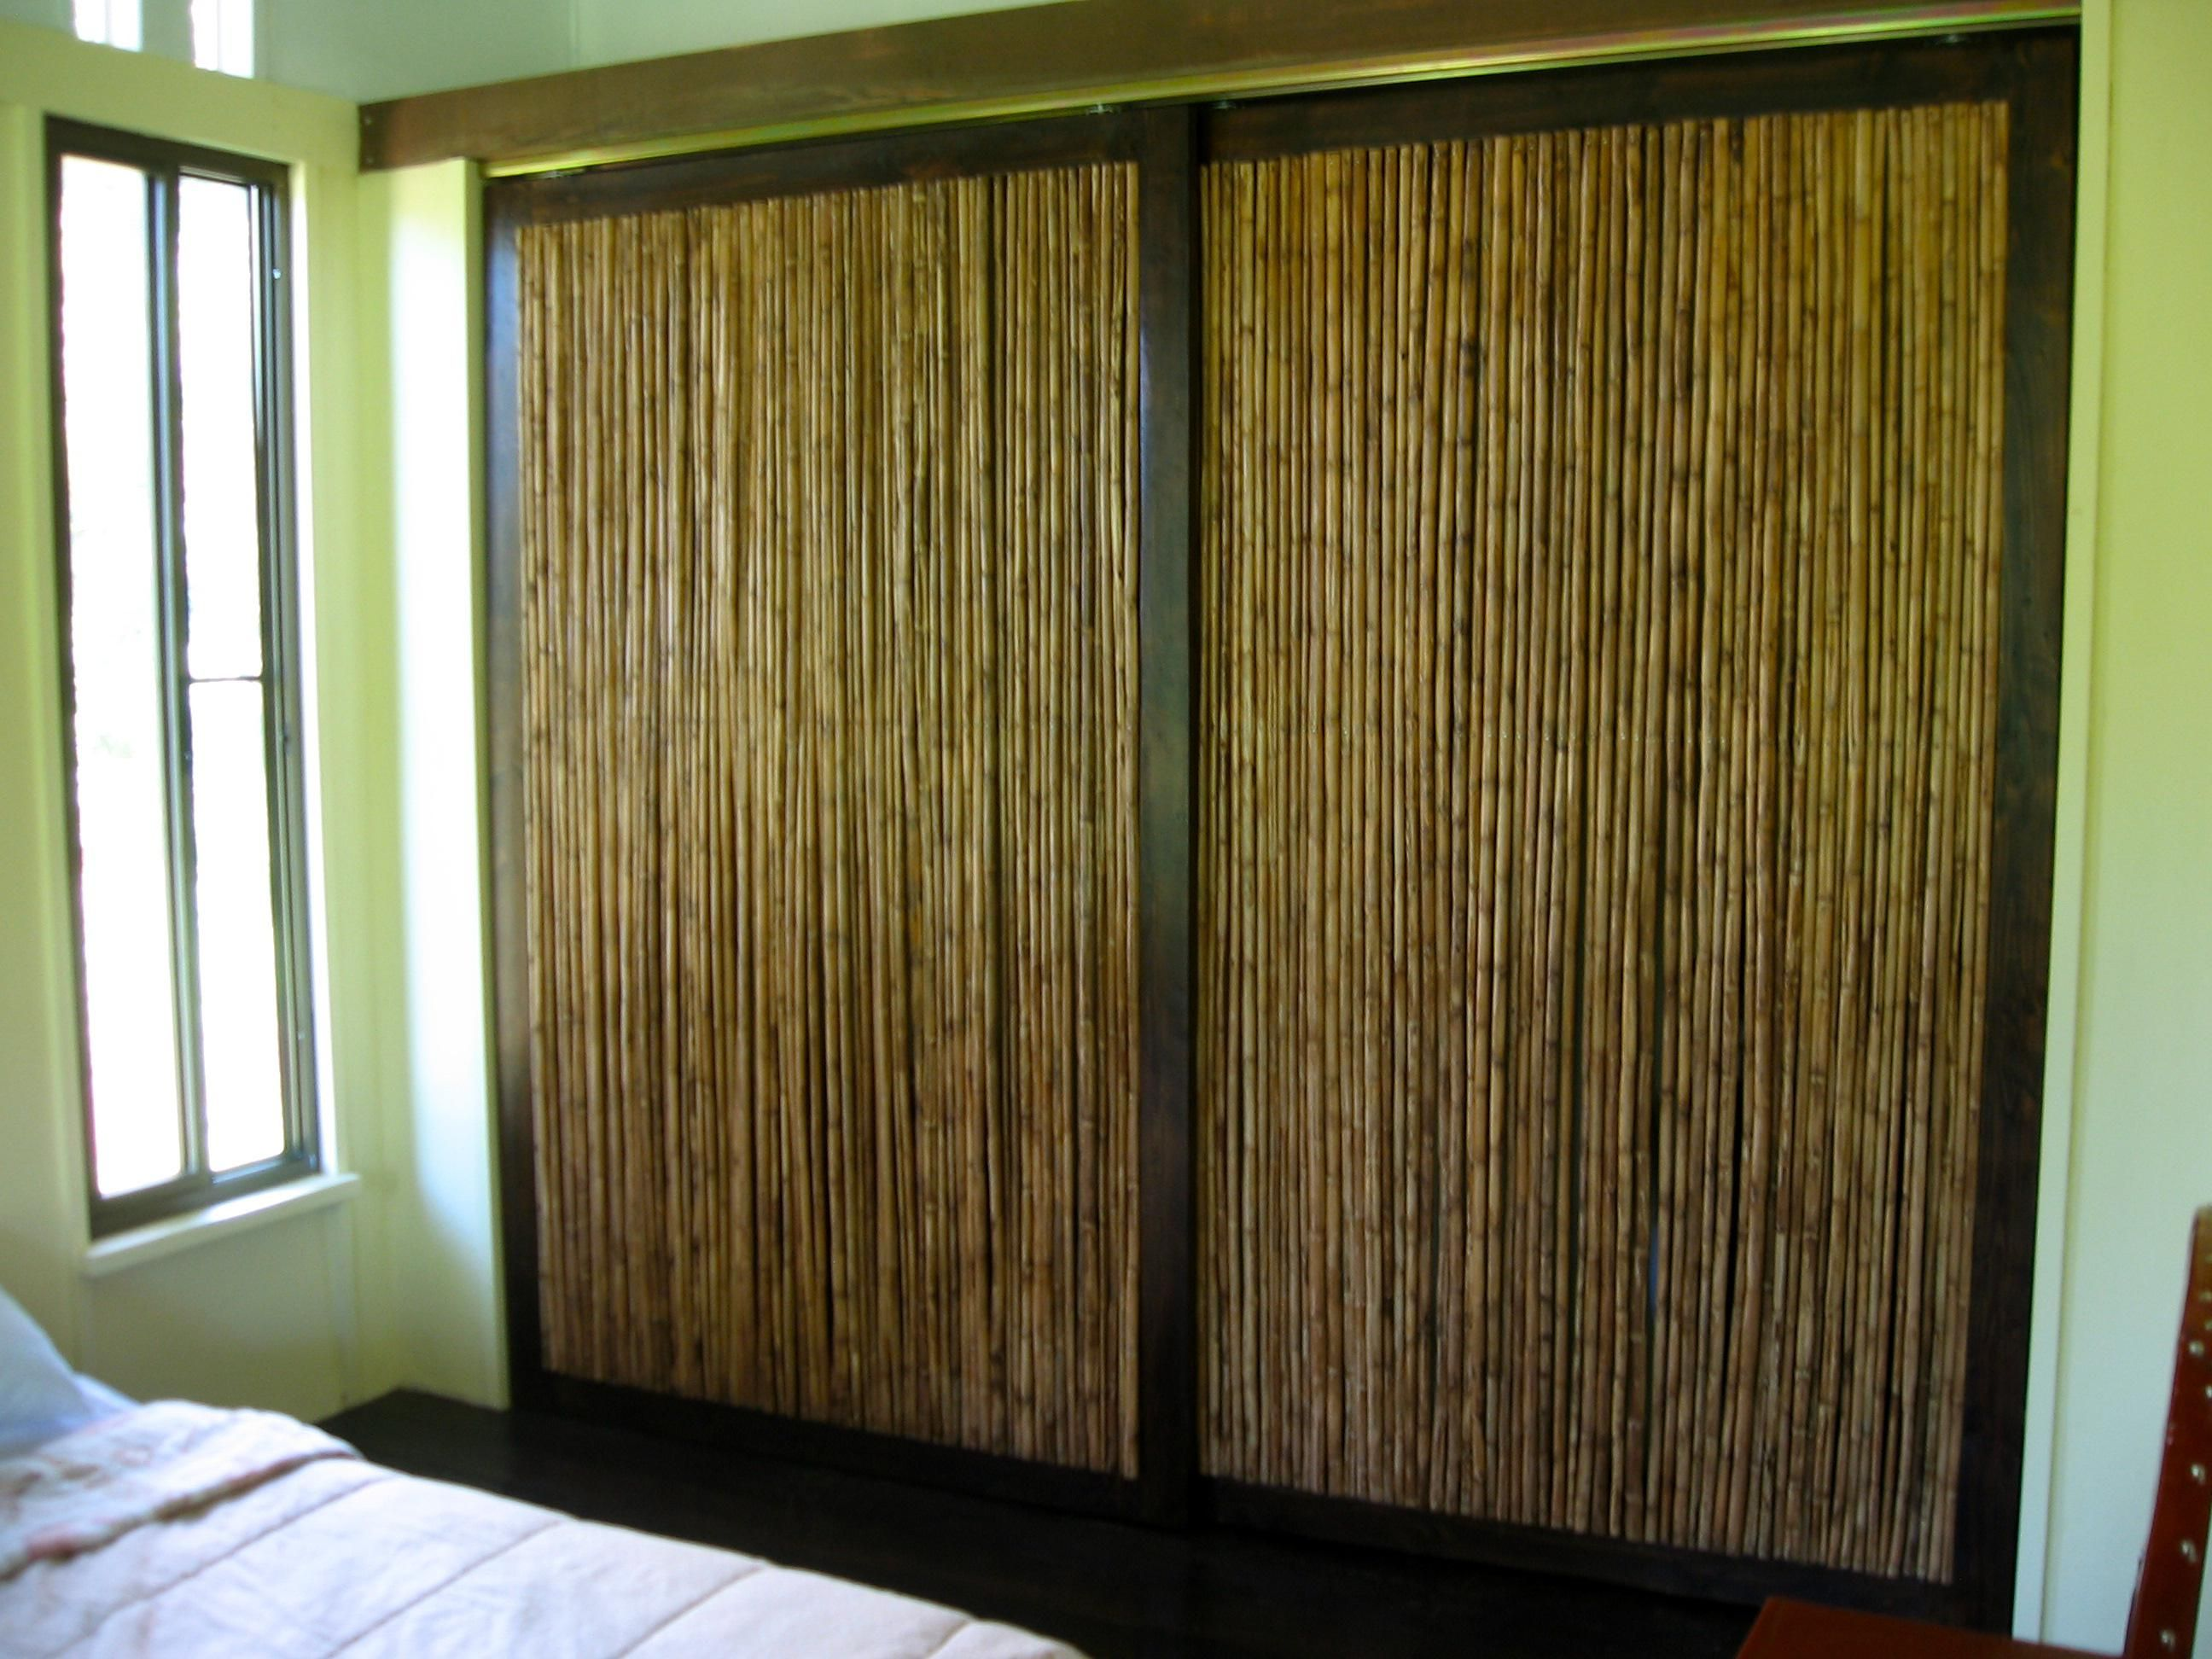 Your home improvements refference solid wood wardrobe closet - Scenic Closet Doors Furniture Home Design Inspirations Plus Closet Doors